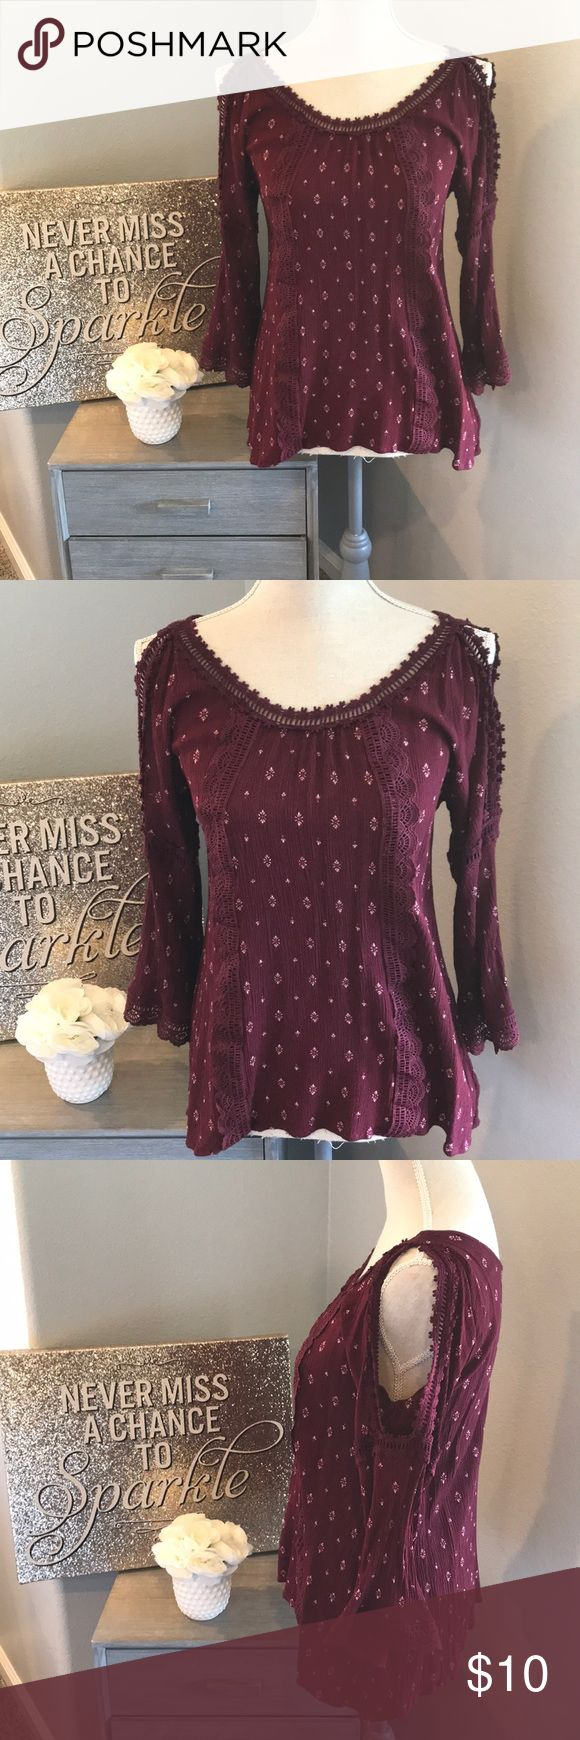 Women's cold shoulder long sleeve blouse shirt Beautiful cold shoulder detail lace. Maroon woman's blouse long sleeve shirt size M  100% Rayon love on a hanger Tops Blouses